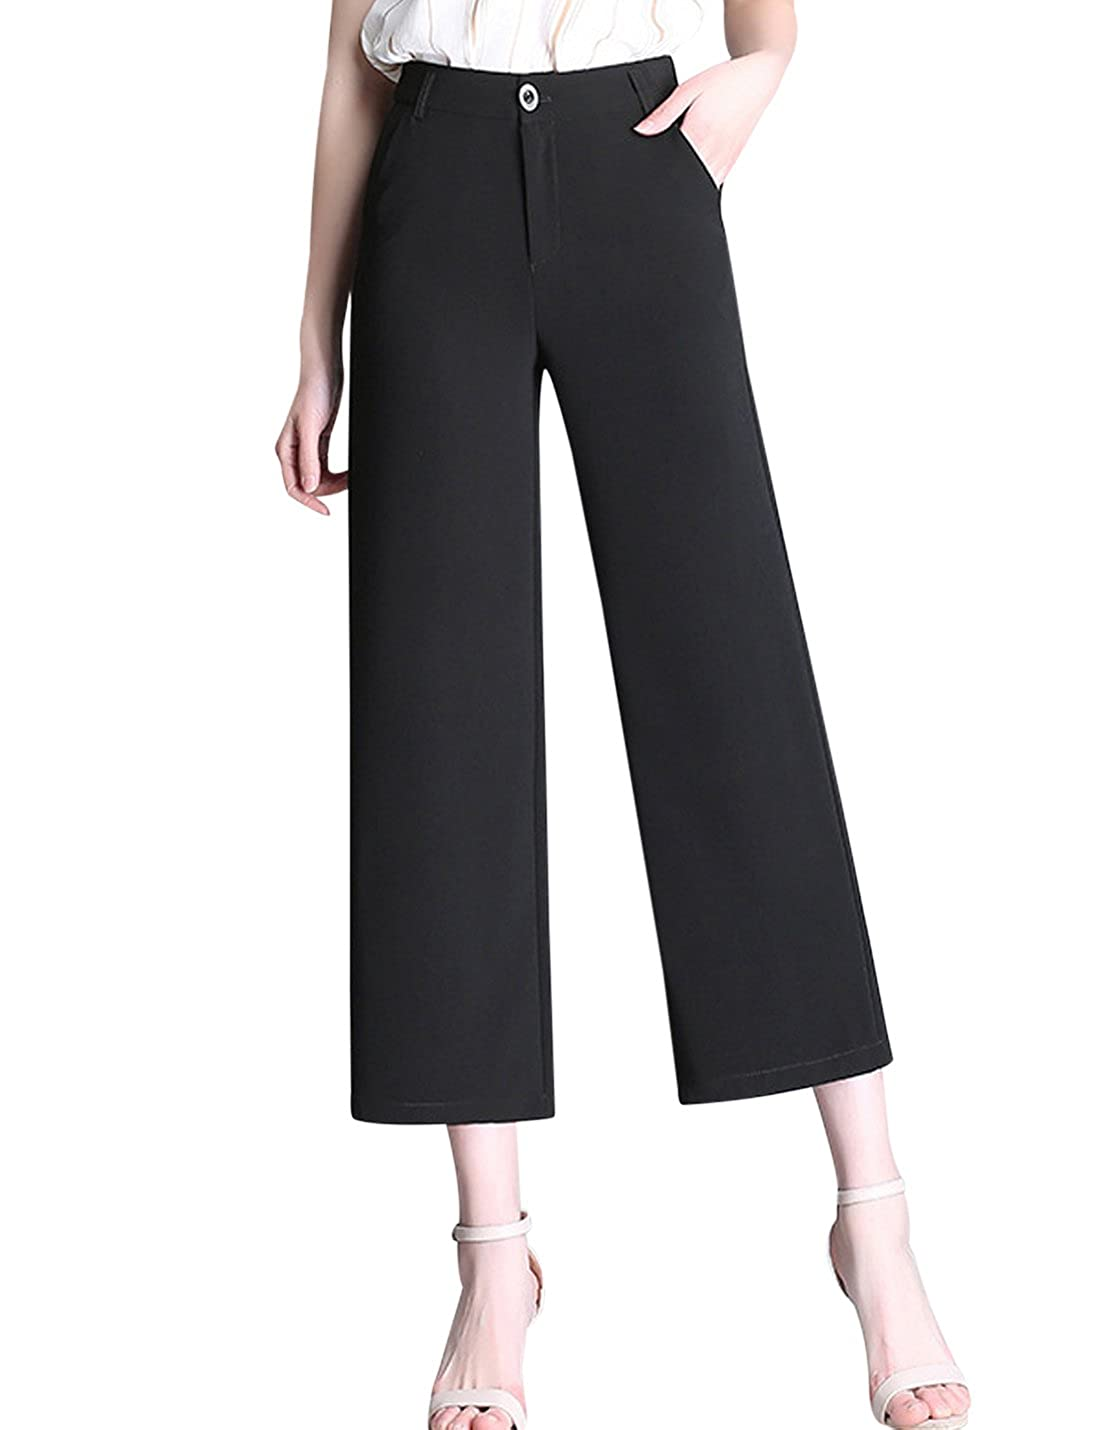 a5390a68e792d Tanming Women s Fashion High Waist Cropped Wide Leg Pants Trousers at  Amazon Women s Clothing store